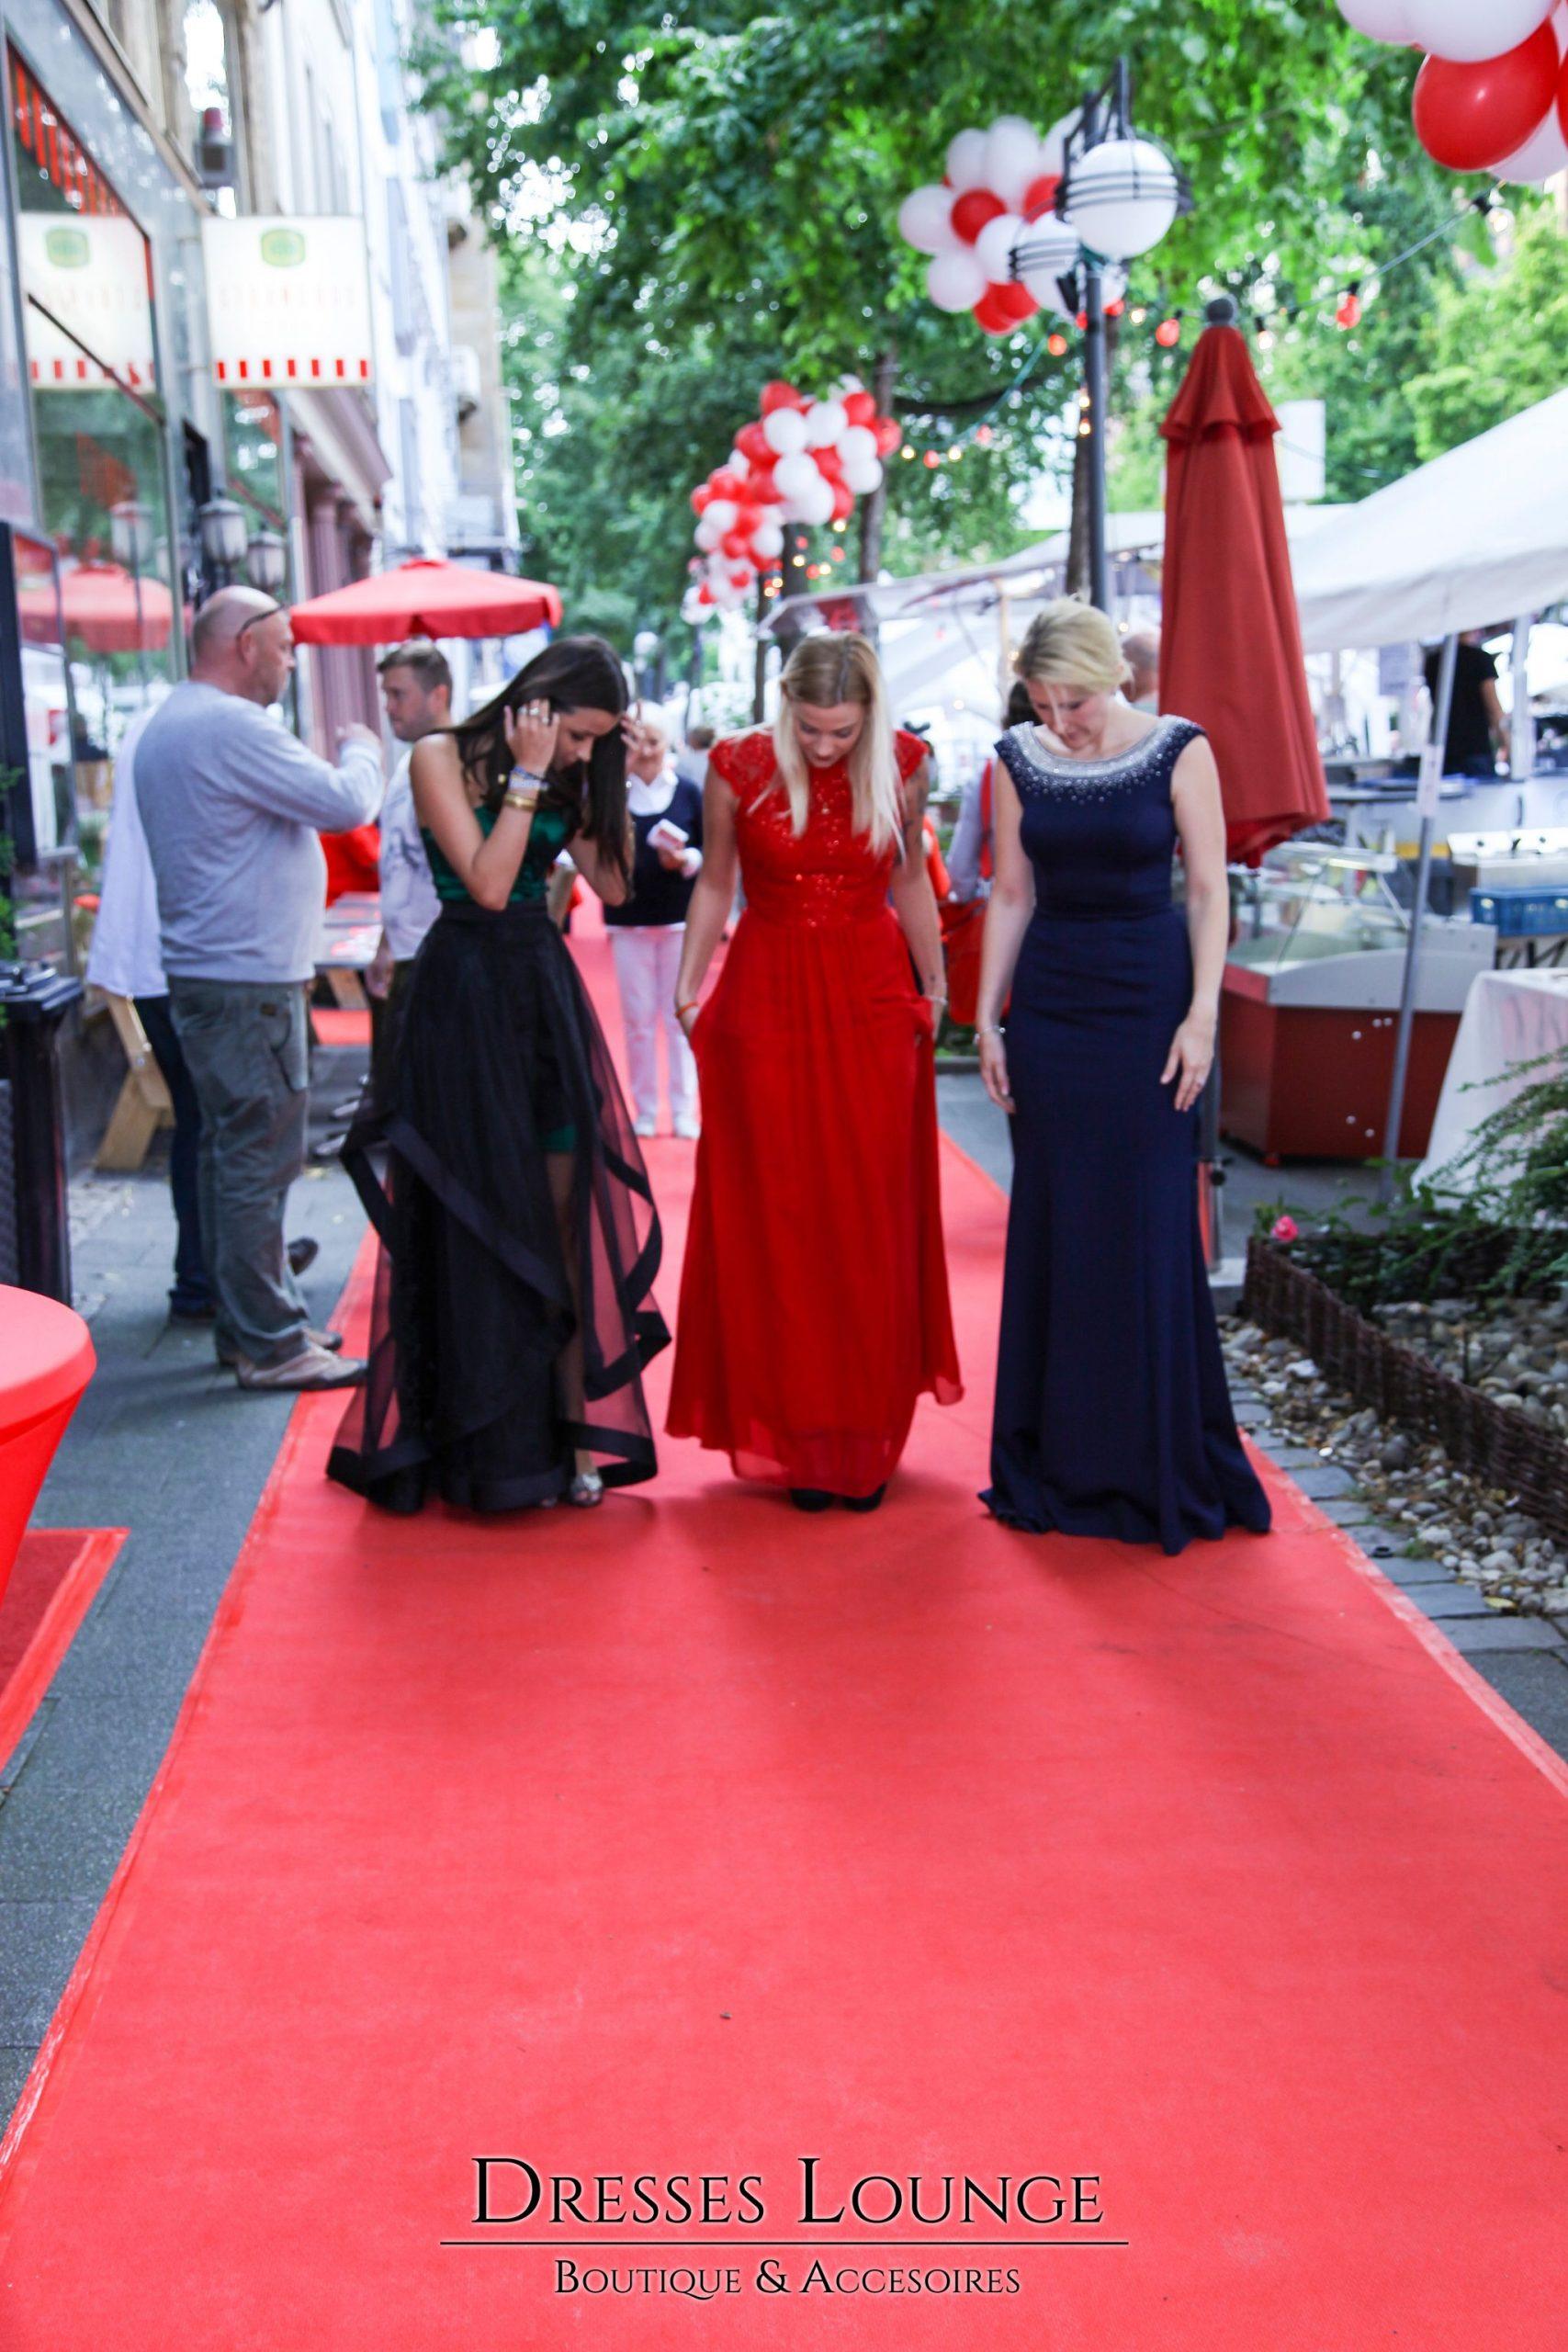 15 Top Abendkleider Wiesbaden Ärmel13 Großartig Abendkleider Wiesbaden für 2019